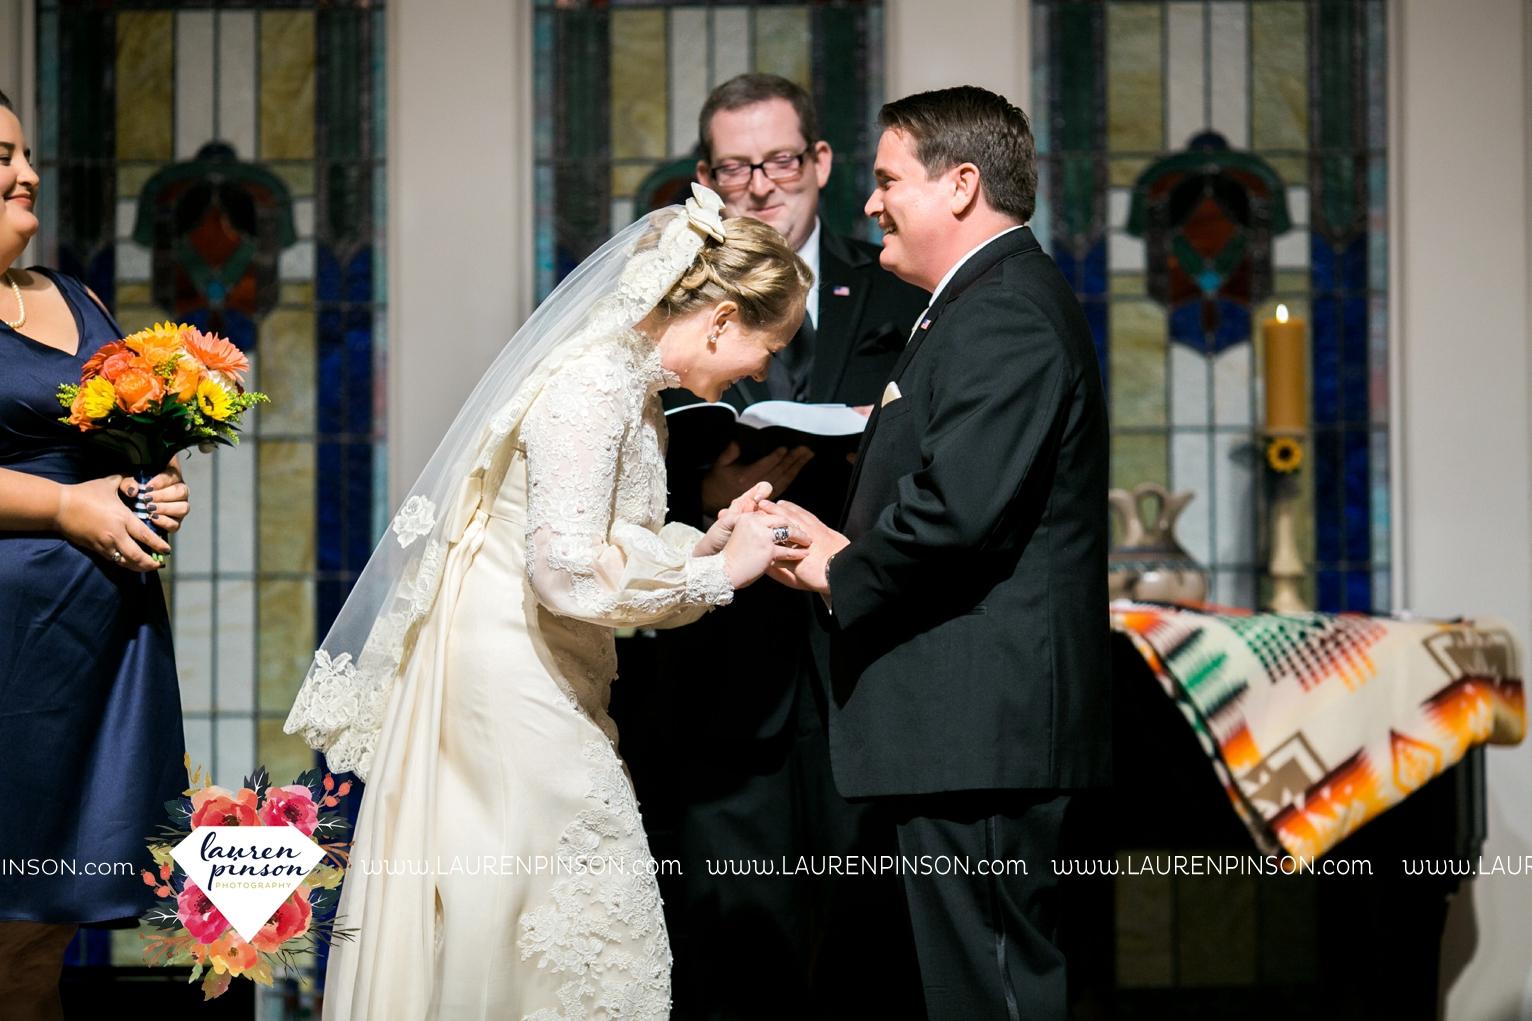 bells-texas-wedding-photography-at-willowood-ranch-chapel-north-texas-wichita-falls-wedding-photographer_1871.jpg